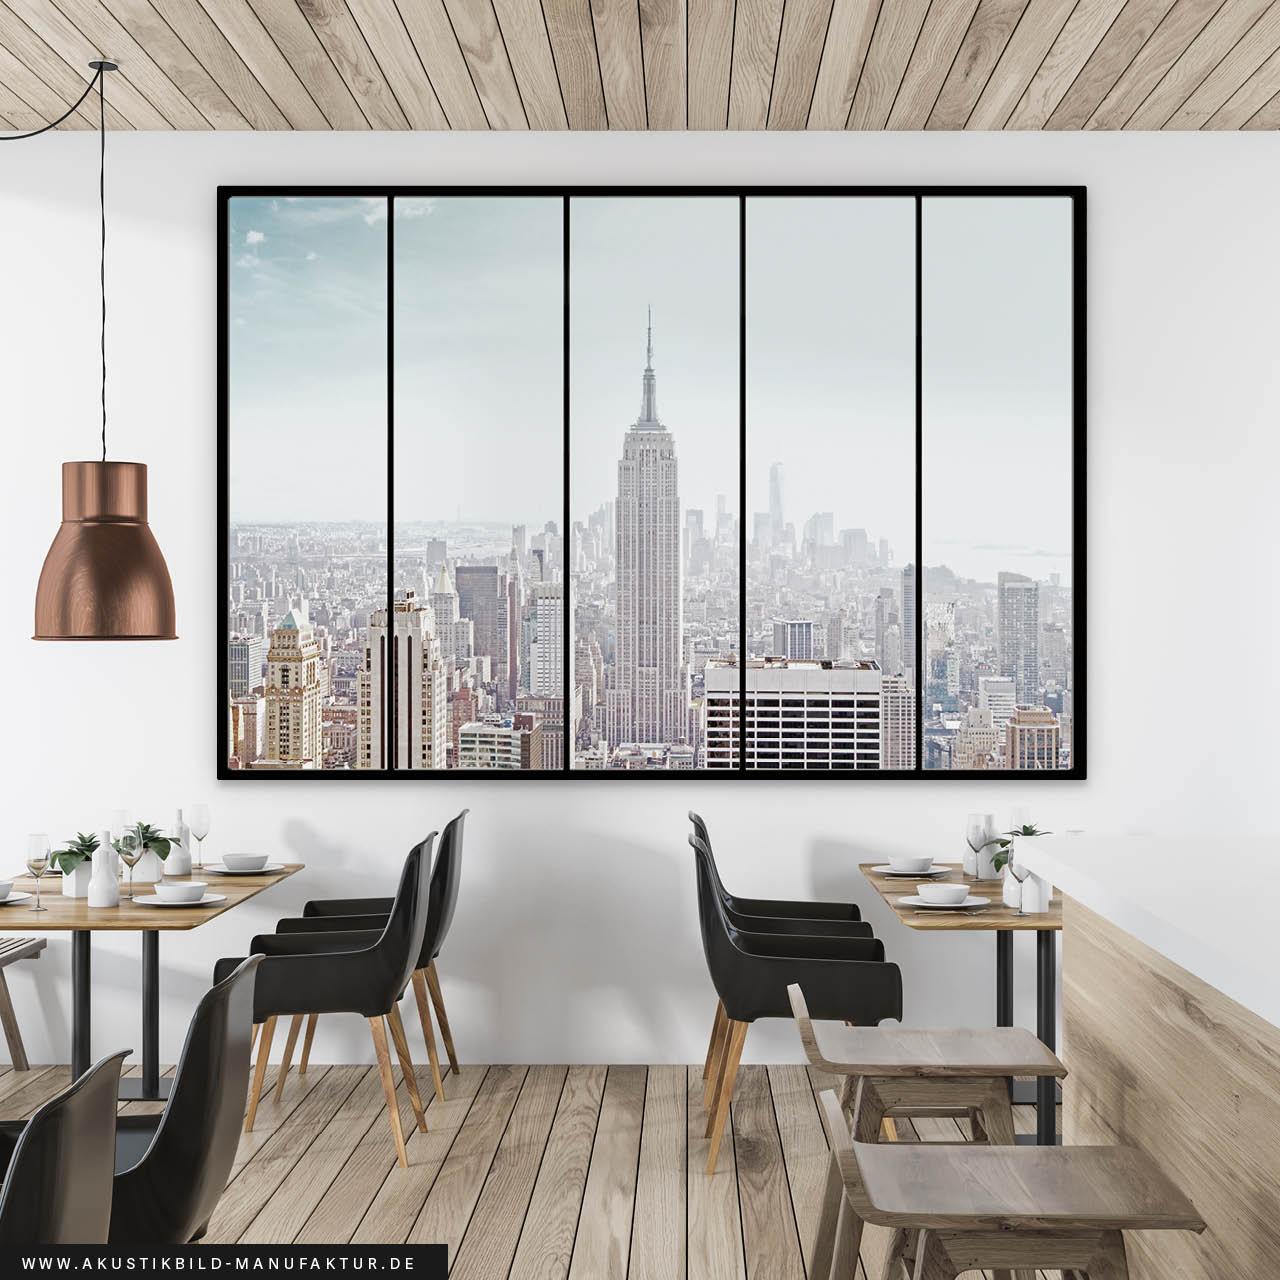 Schallabsorber Akustikbild New York Window